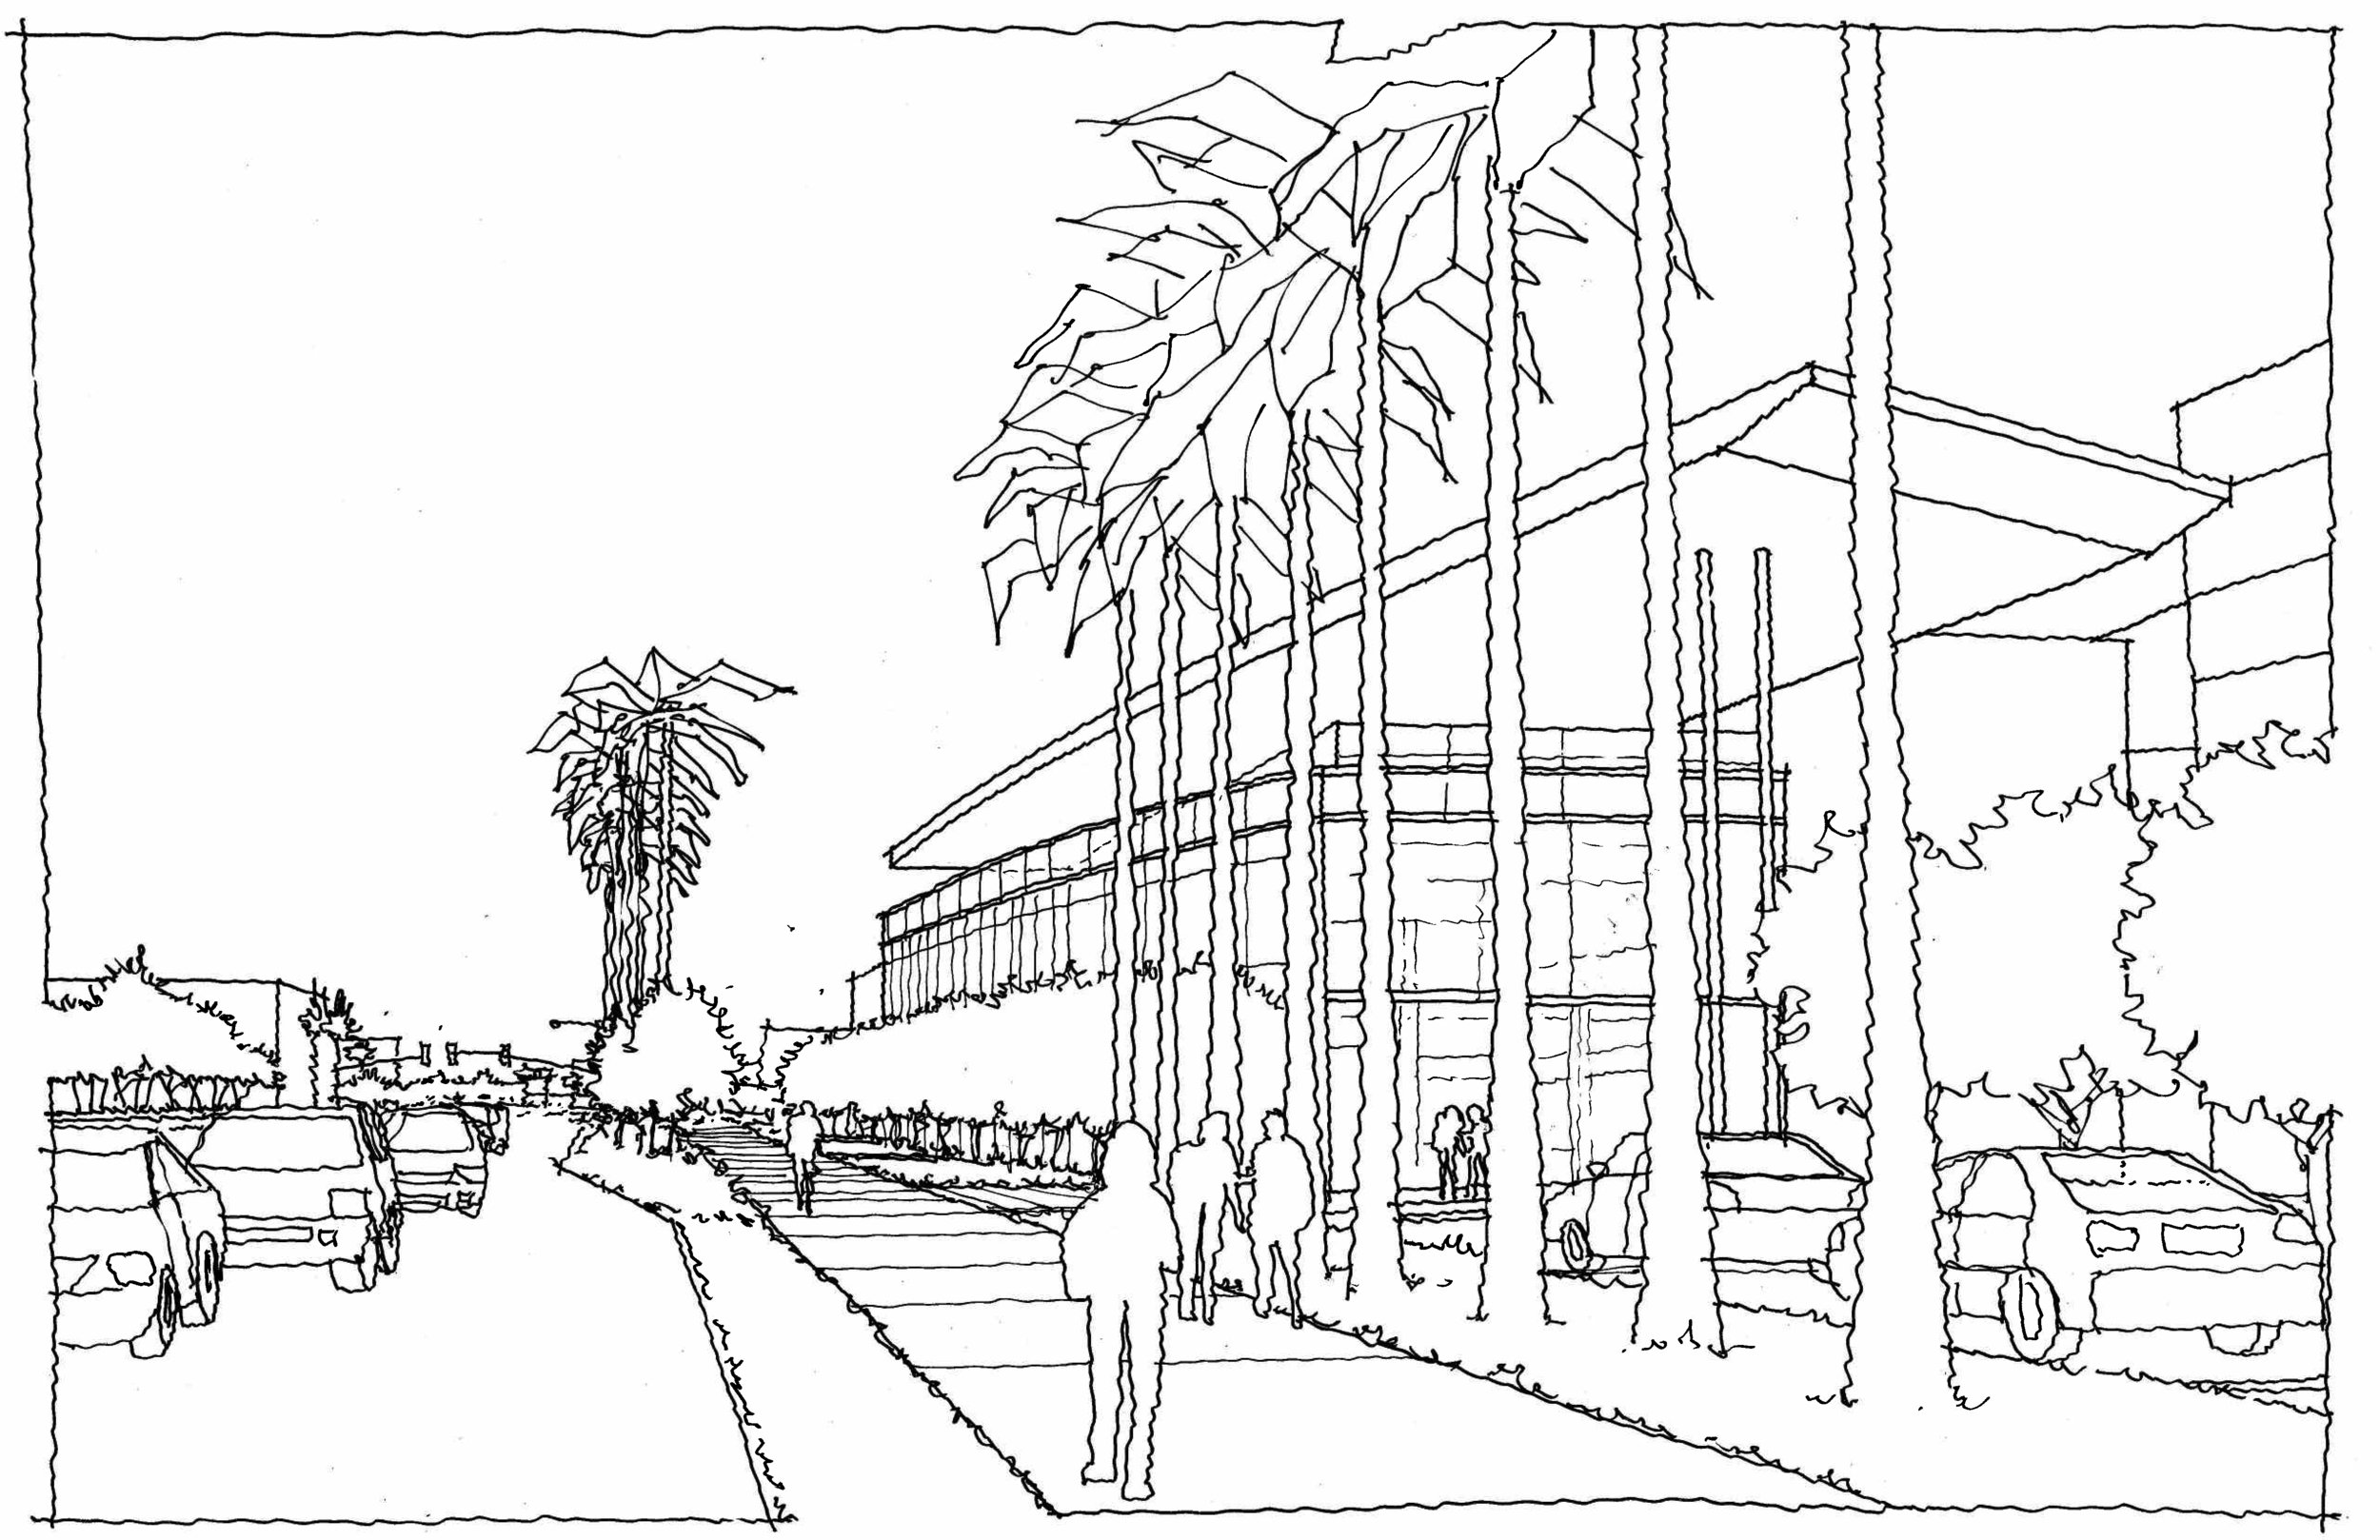 Anchor Center  (Mixed Use, ~60,000 Sq Ft)